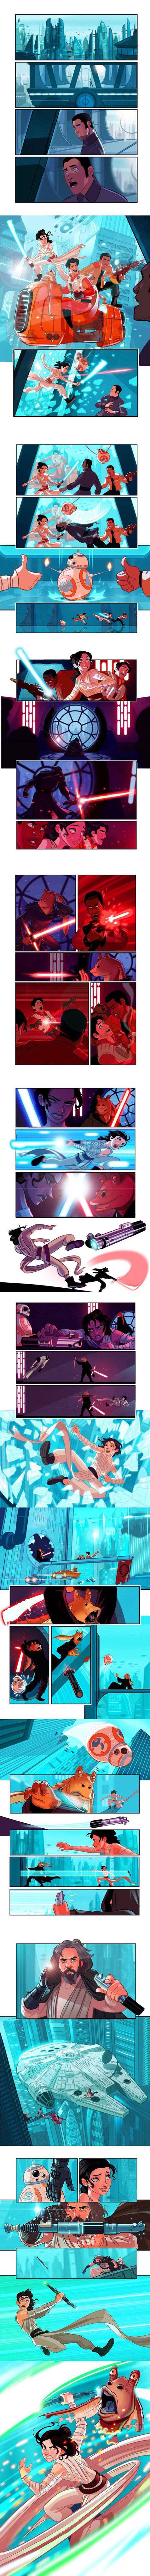 Poe Dameron, Finn, Rey, BB8, Jar Jar, Star Wars, The Force Awakens, part 7, part 7.5, cartoon, comic,